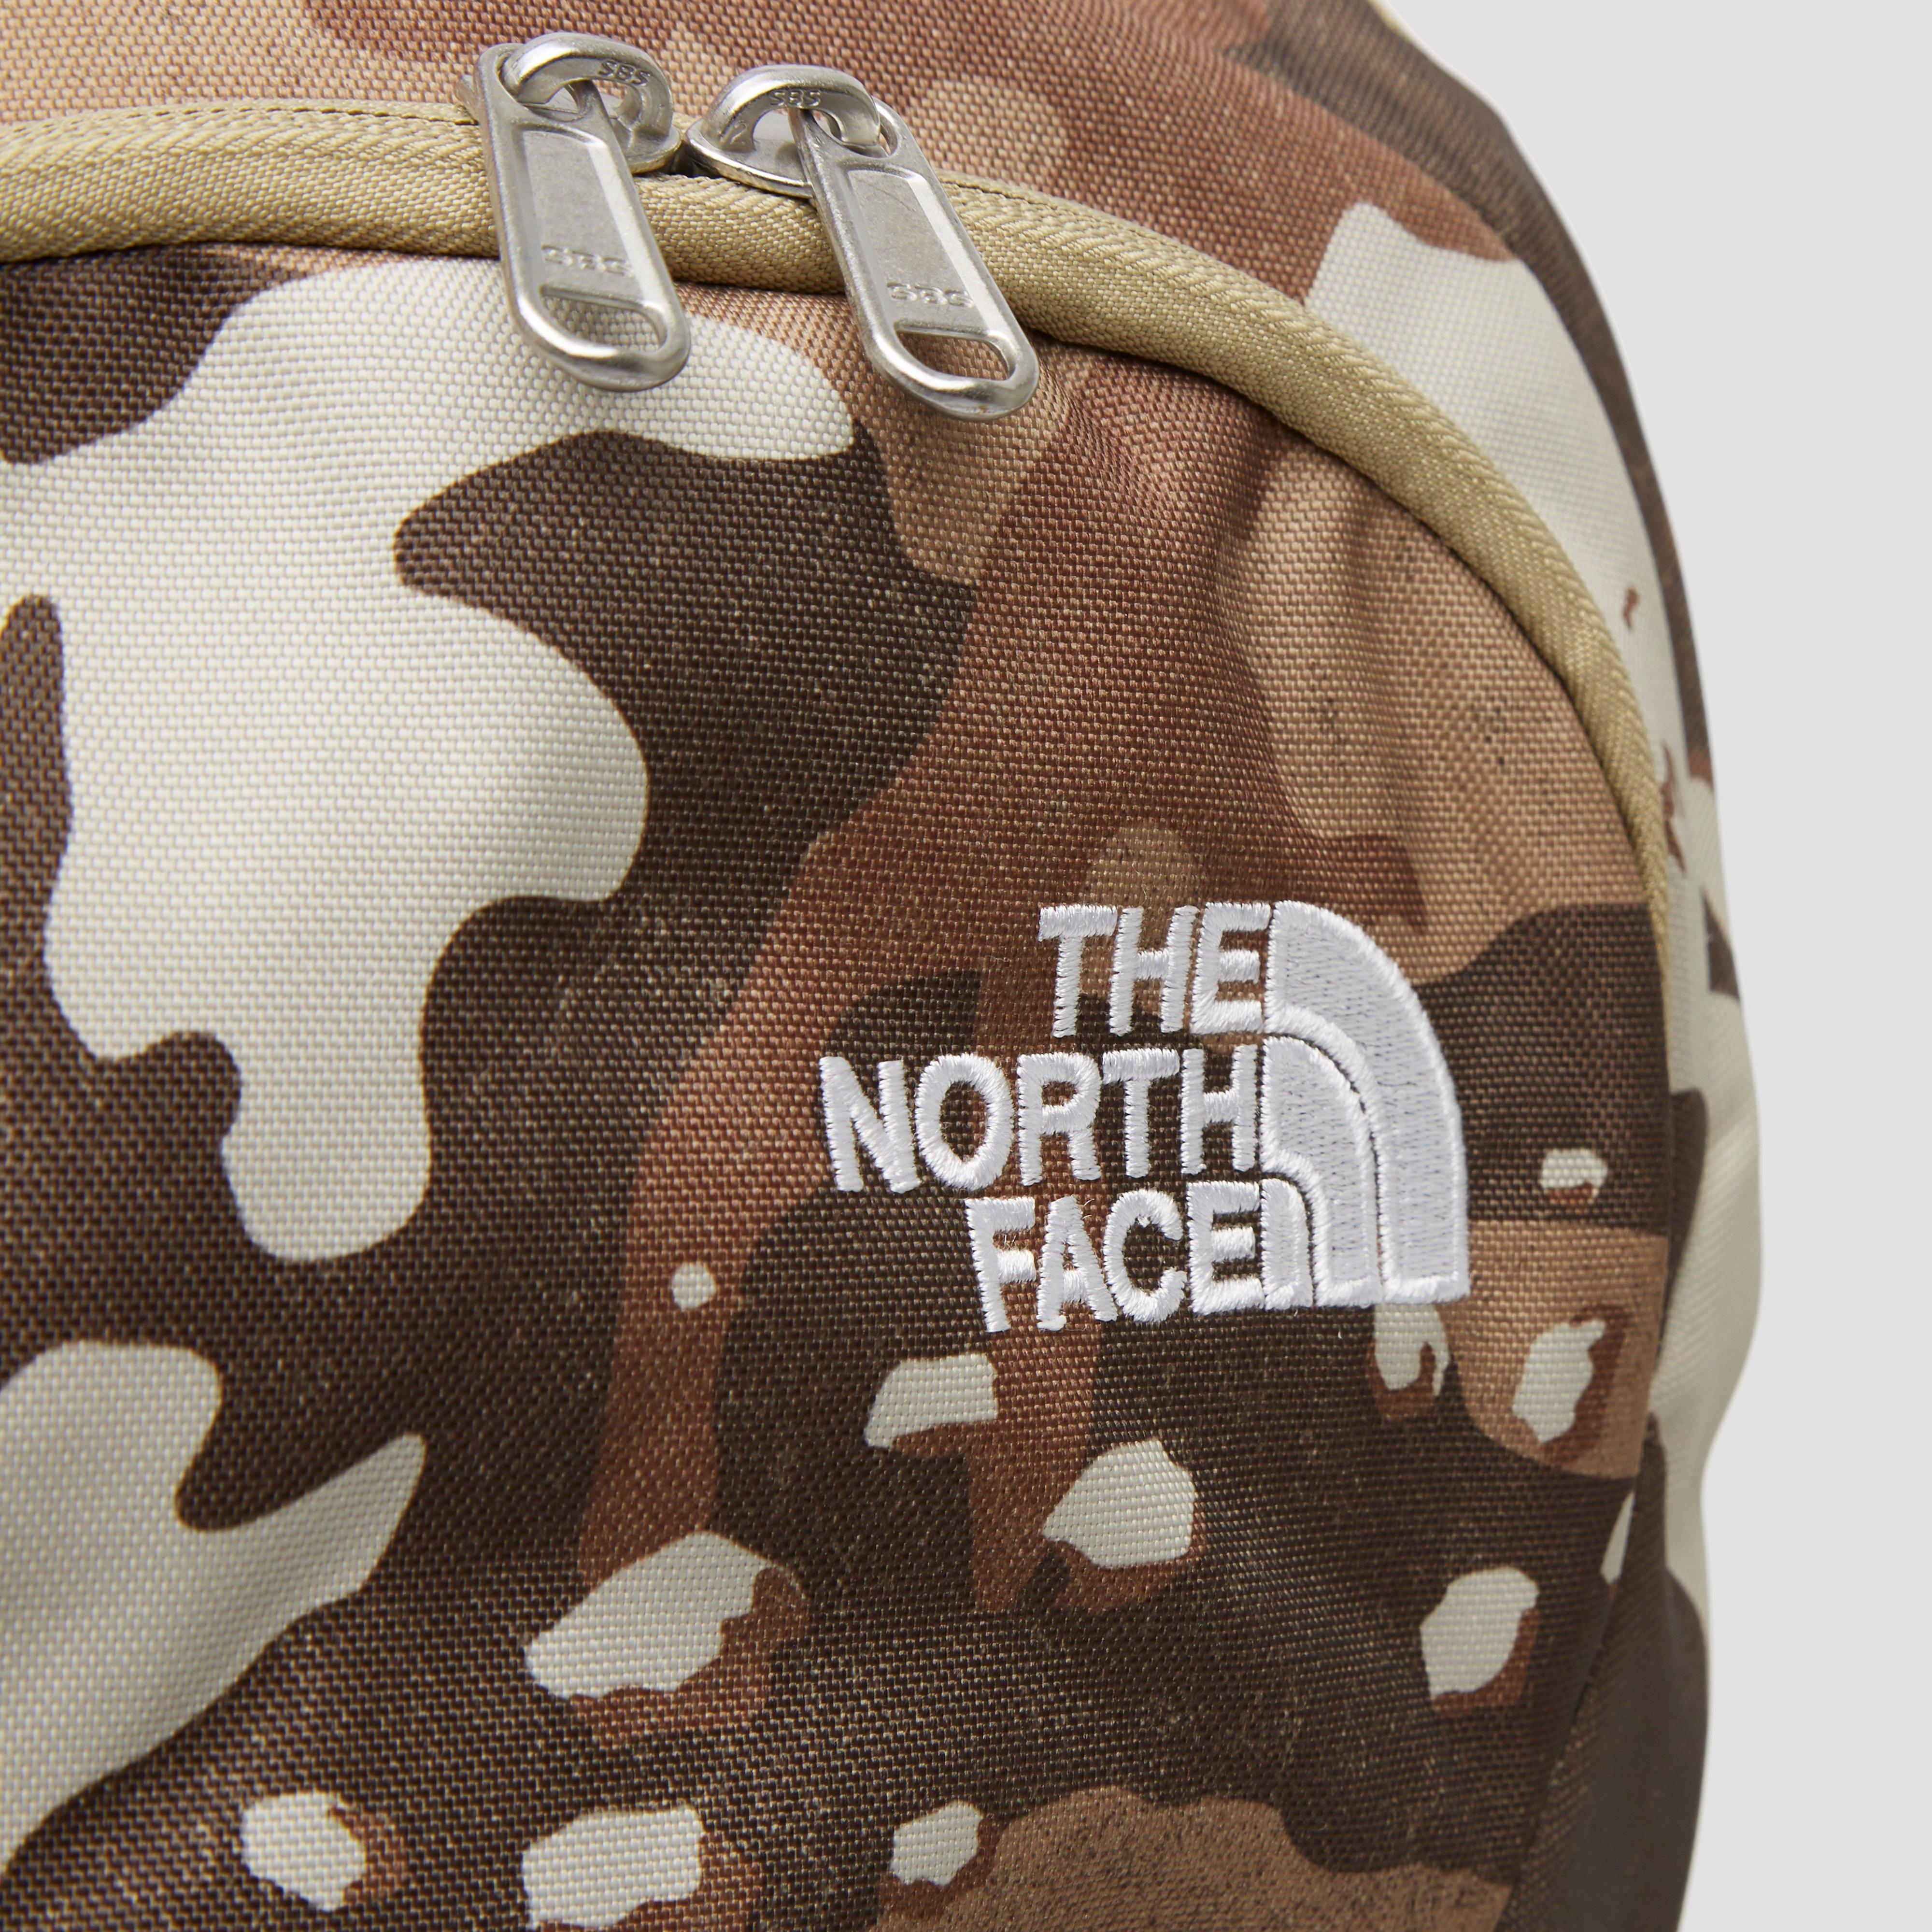 THE NORTH FACE RODEY DAYPACK 27 LITER GROEN/BRUIN